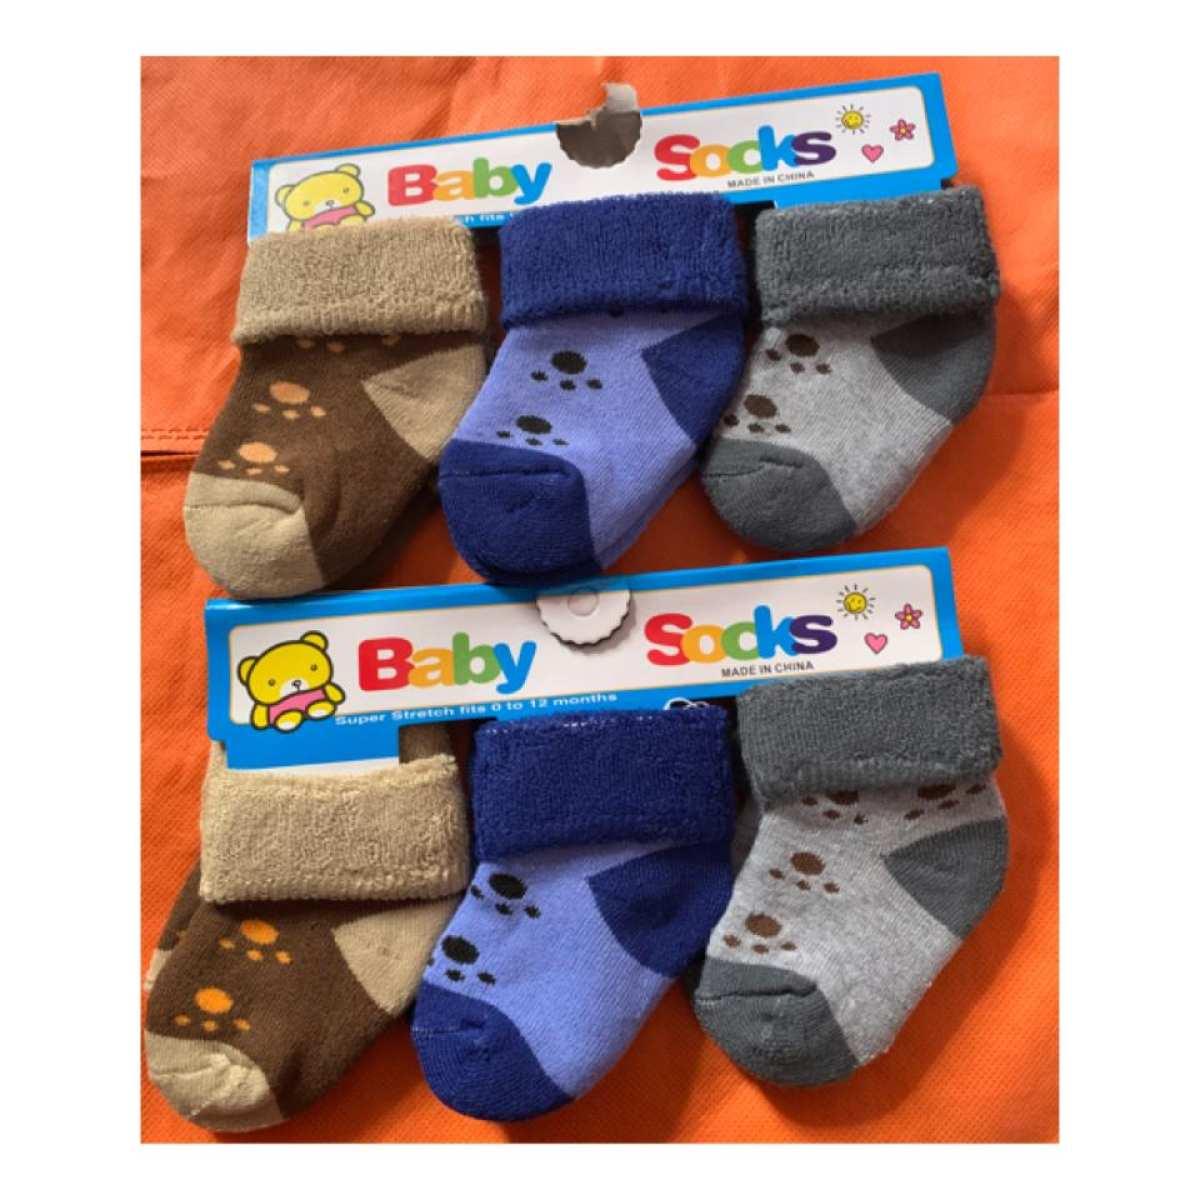 Socks Warm Socks for Baby Kids Soft Fleece Cotton Socks Combo of 3 (0-2 years)Color May Vary